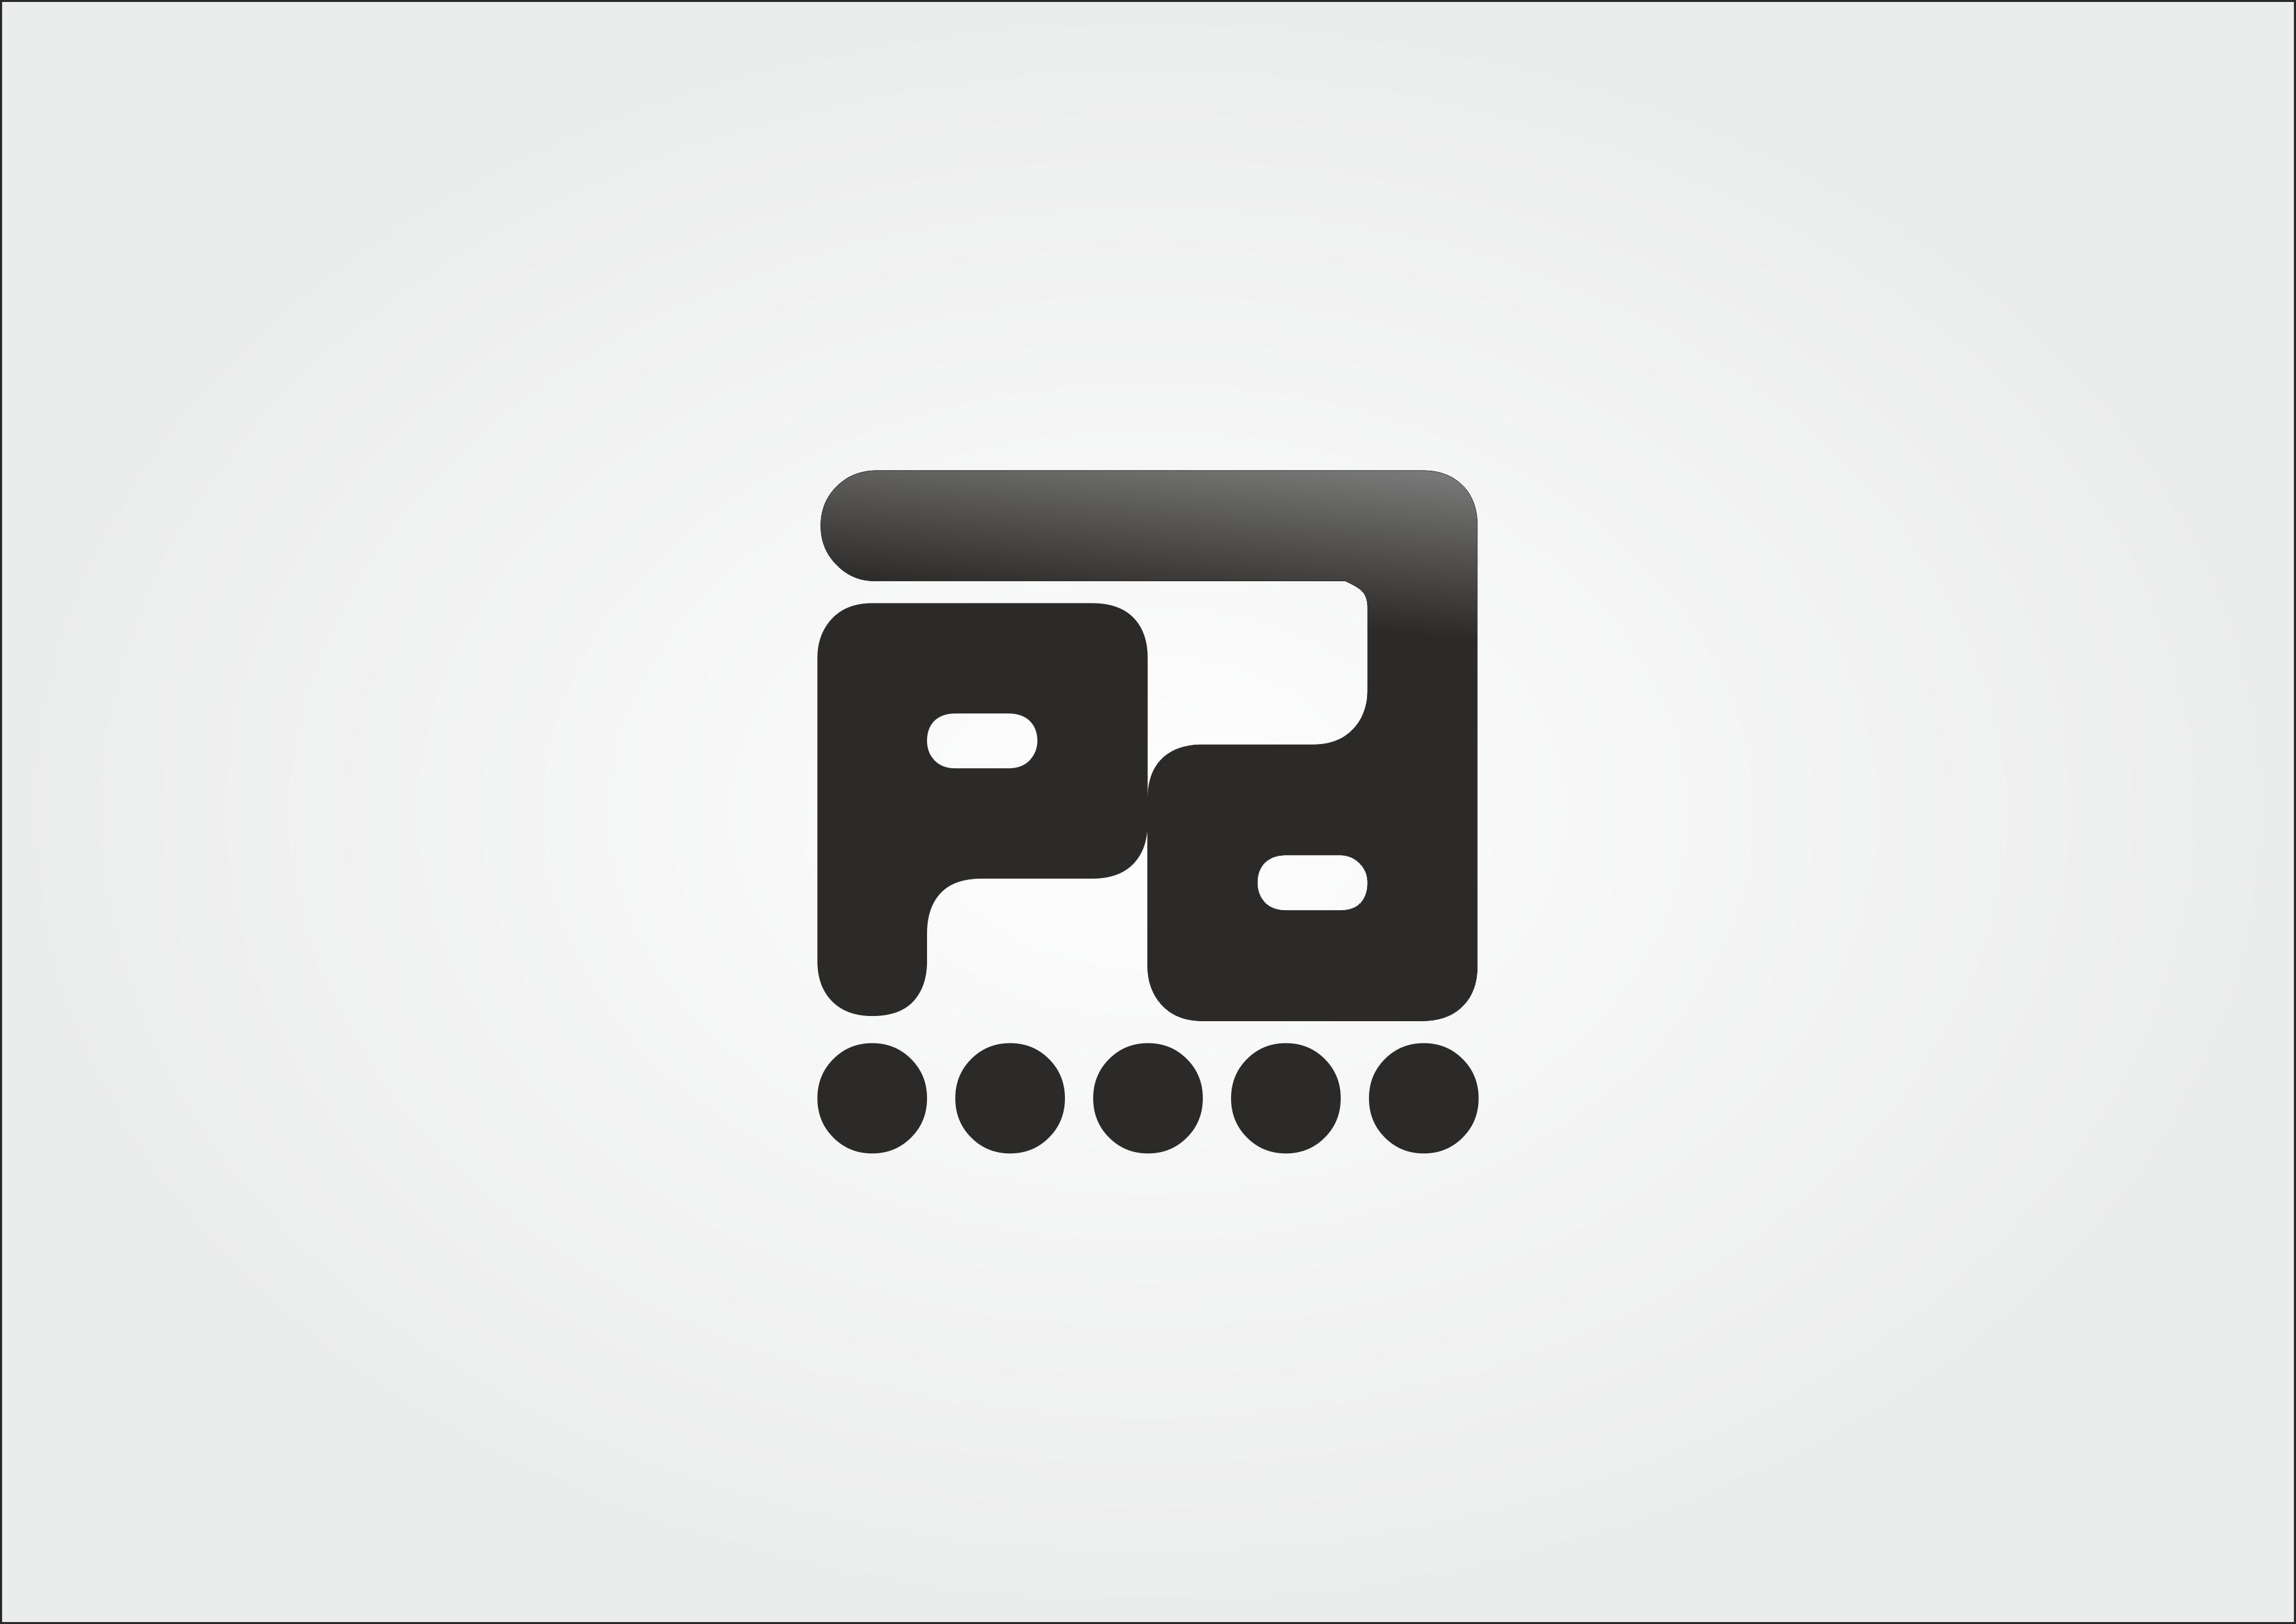 Ребрендинг логотипа  фото f_3325ad7760adc018.png